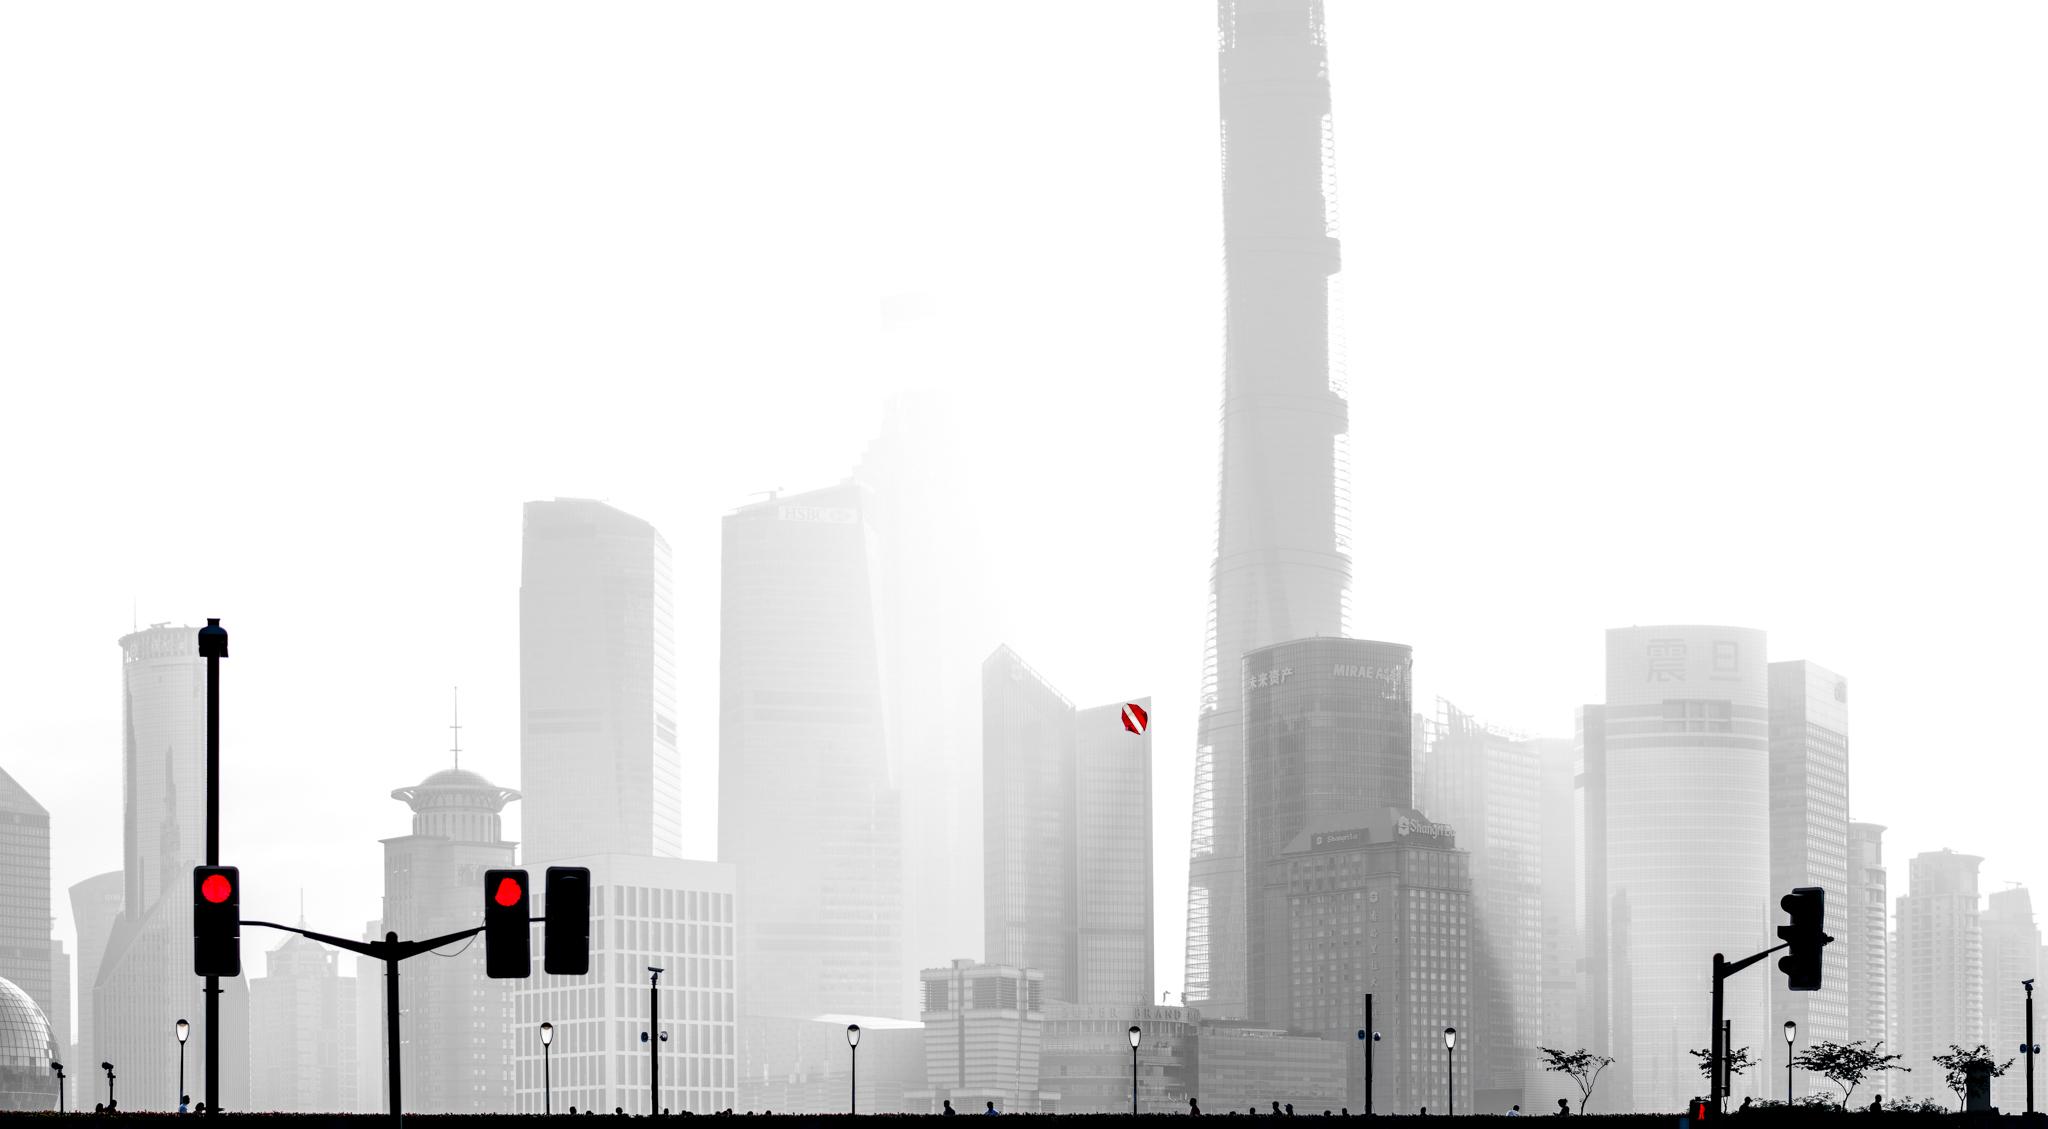 Shanghai, China - October 10, 2015